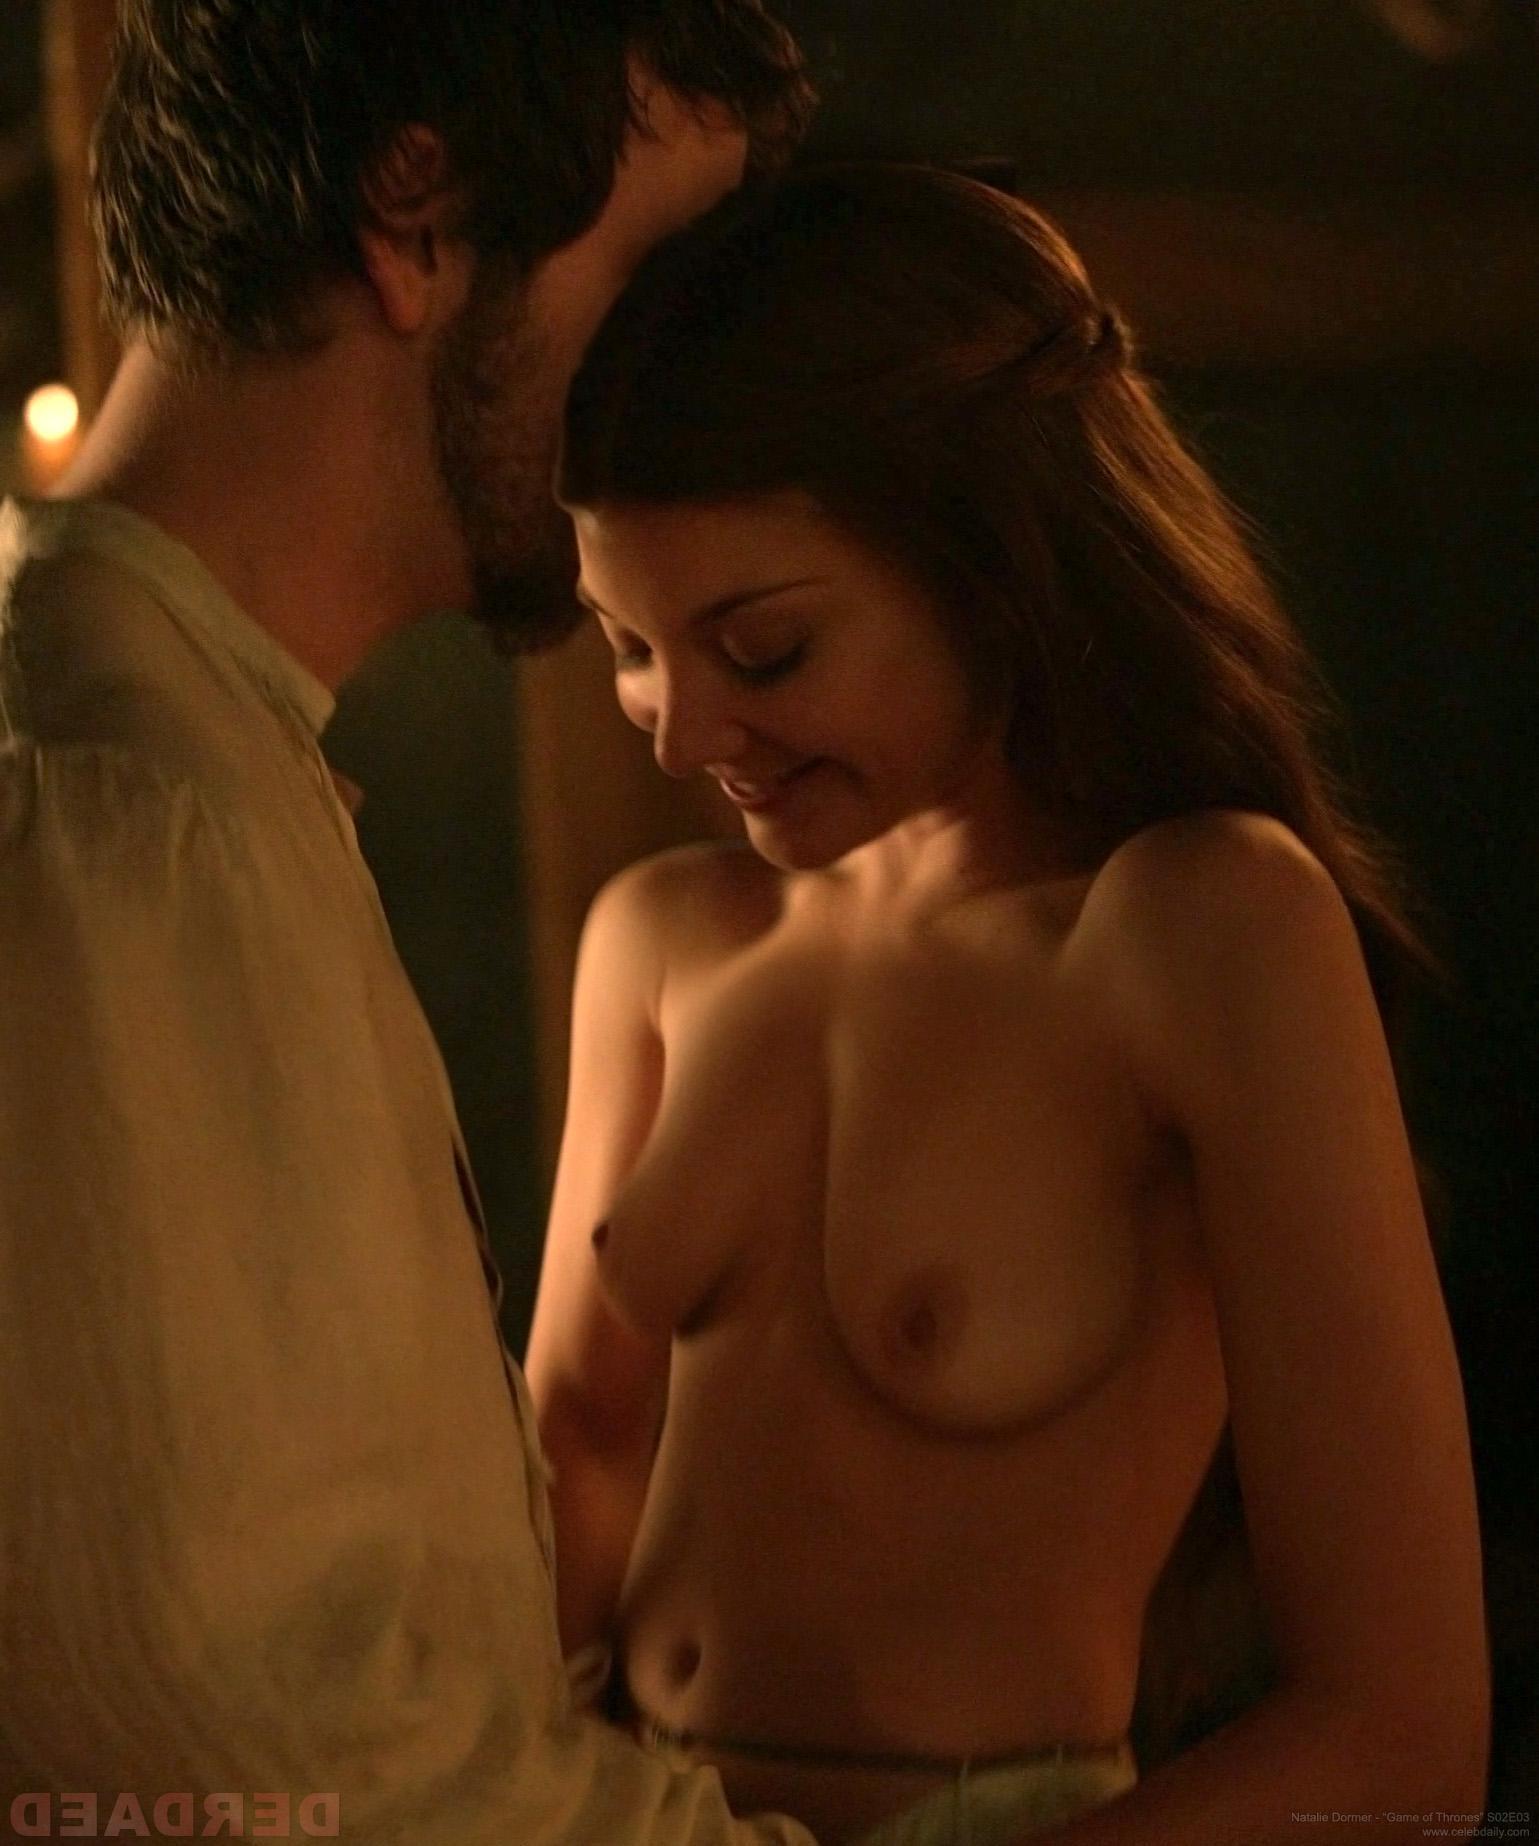 Natalie Dormer se desnuda